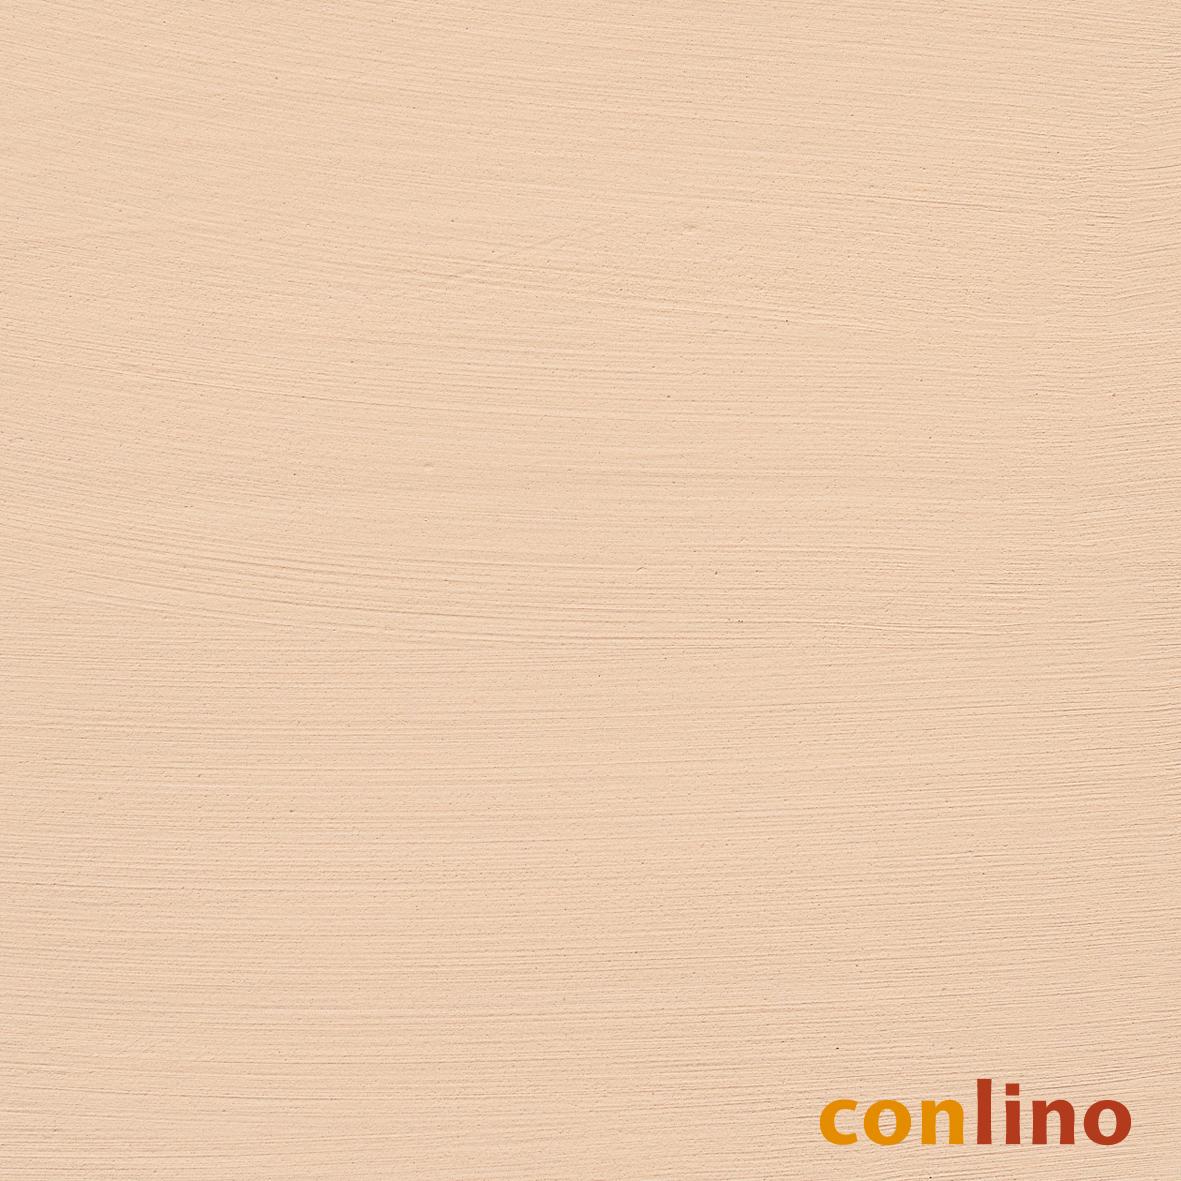 conlino Lehmfarbe Tinaja CL 114